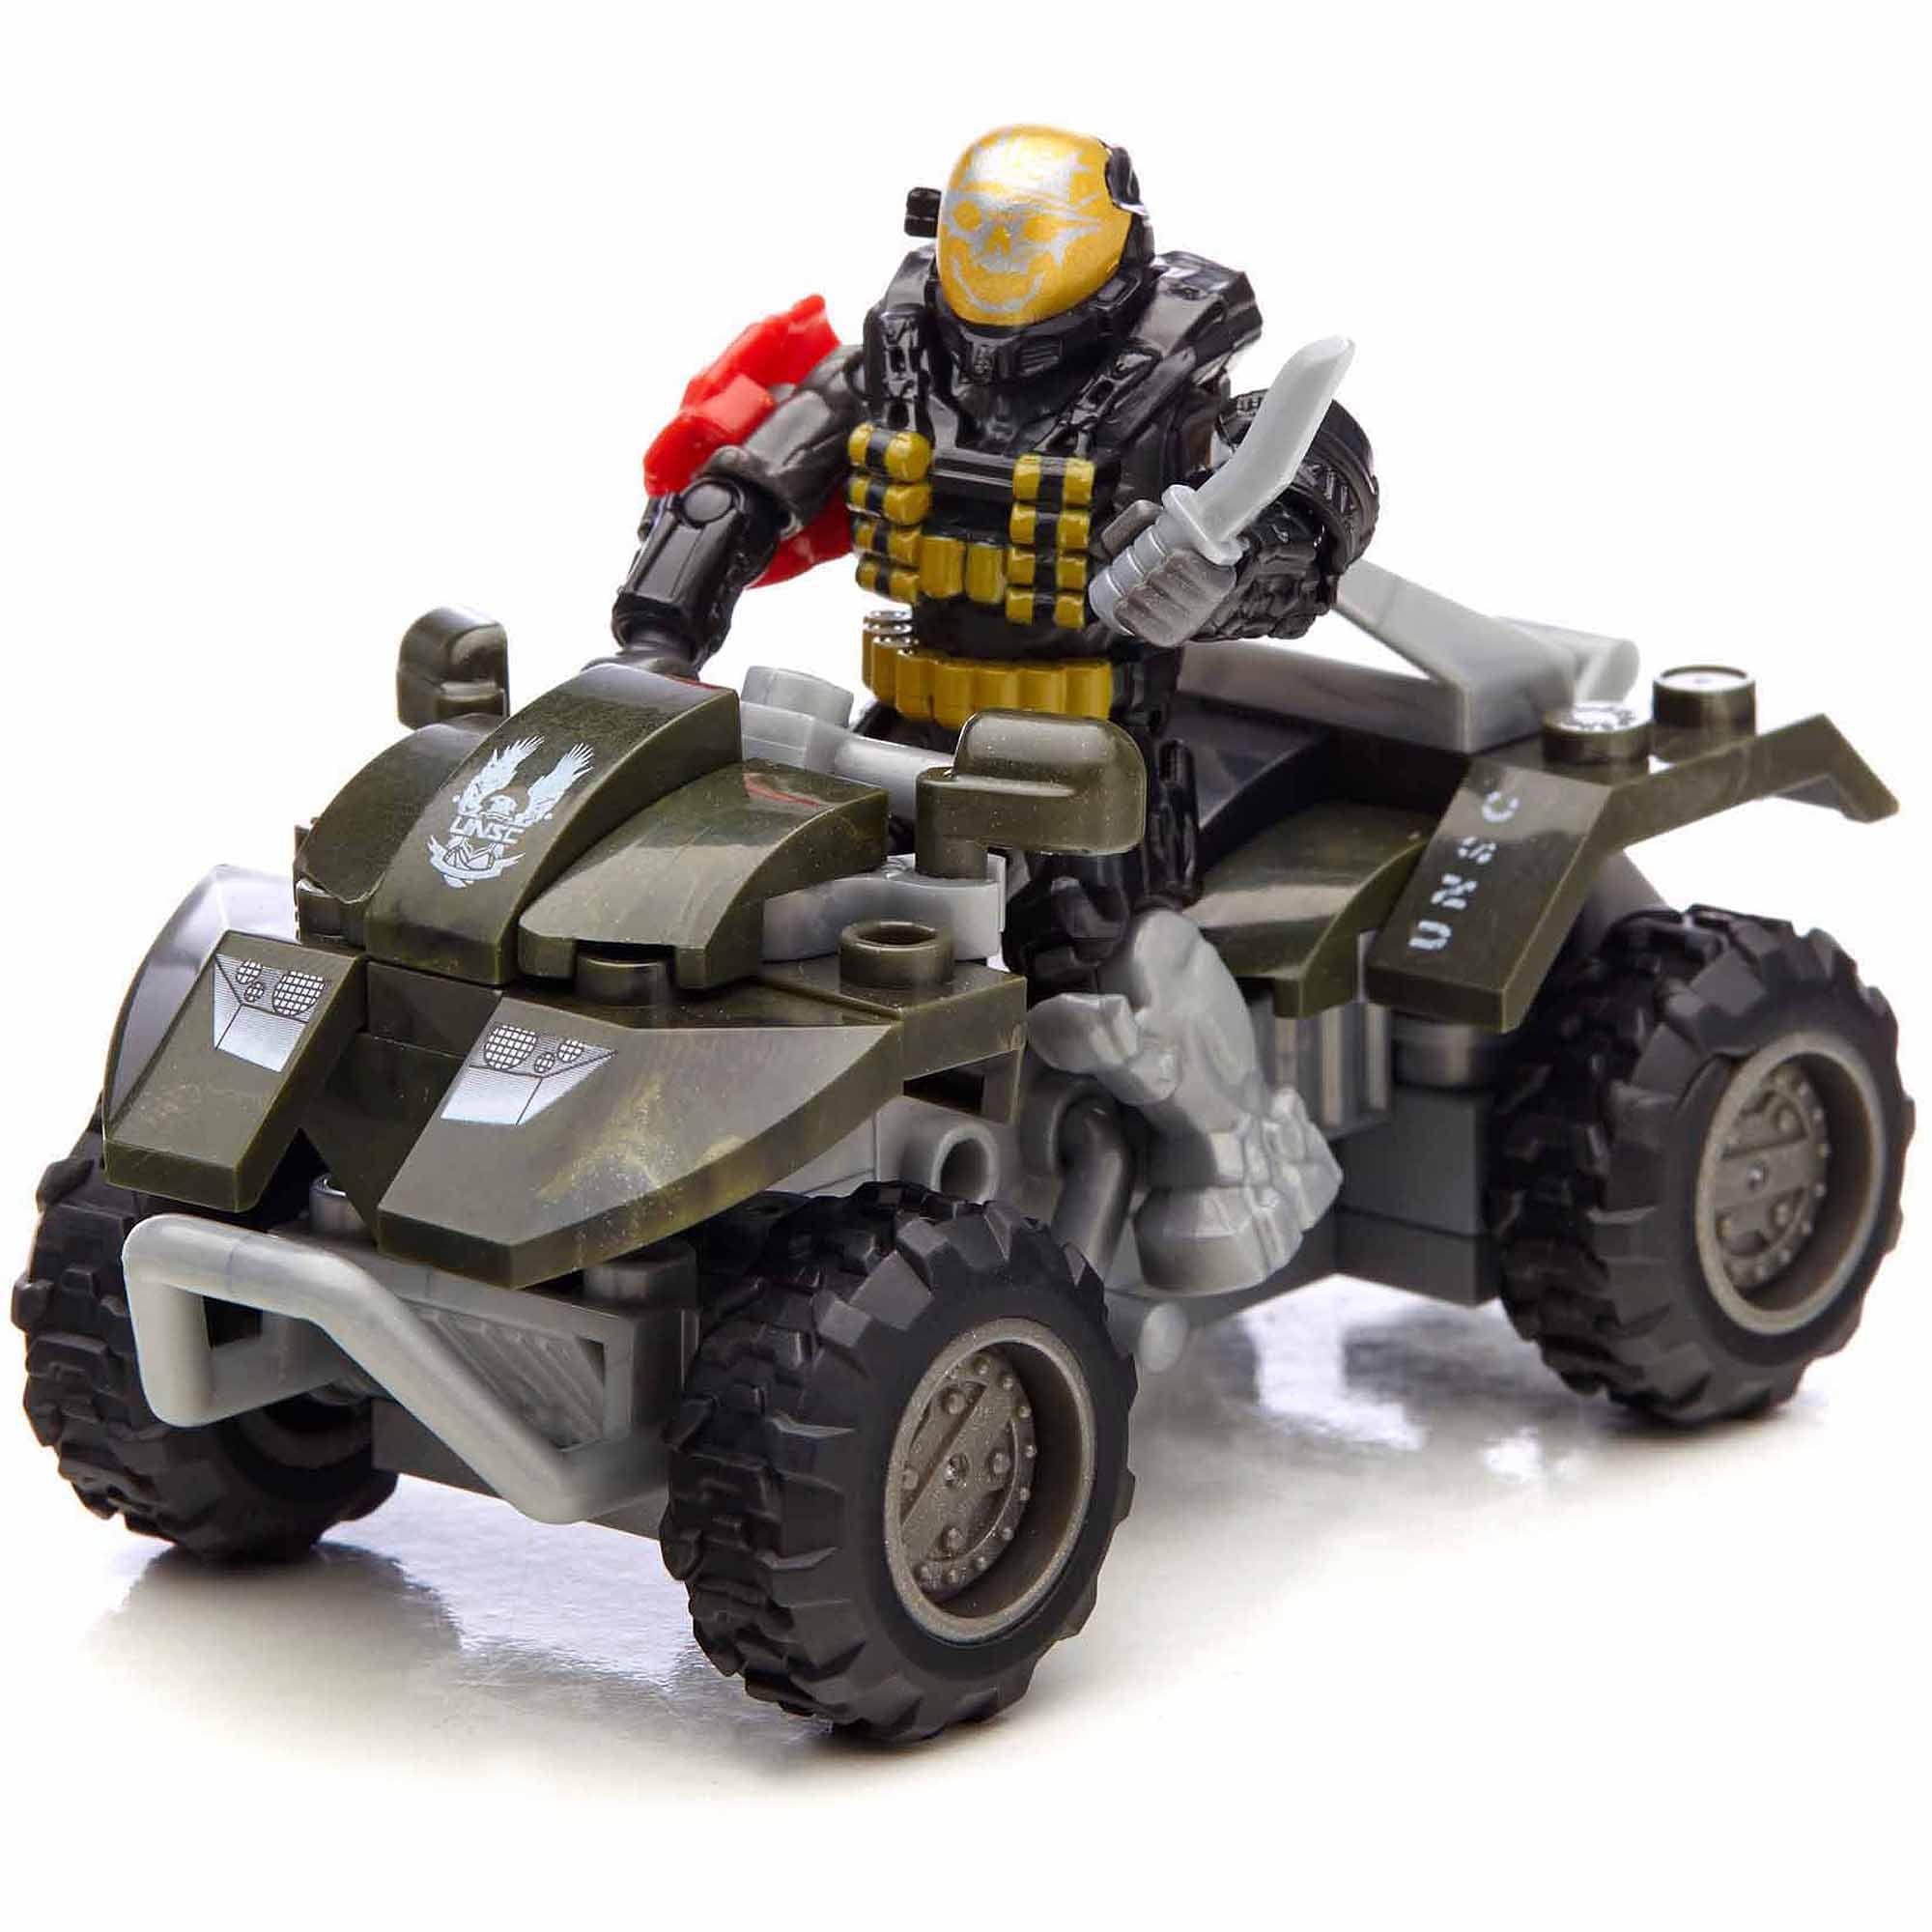 Mega Bloks Halo UNSC All-Terrain Mongoose by